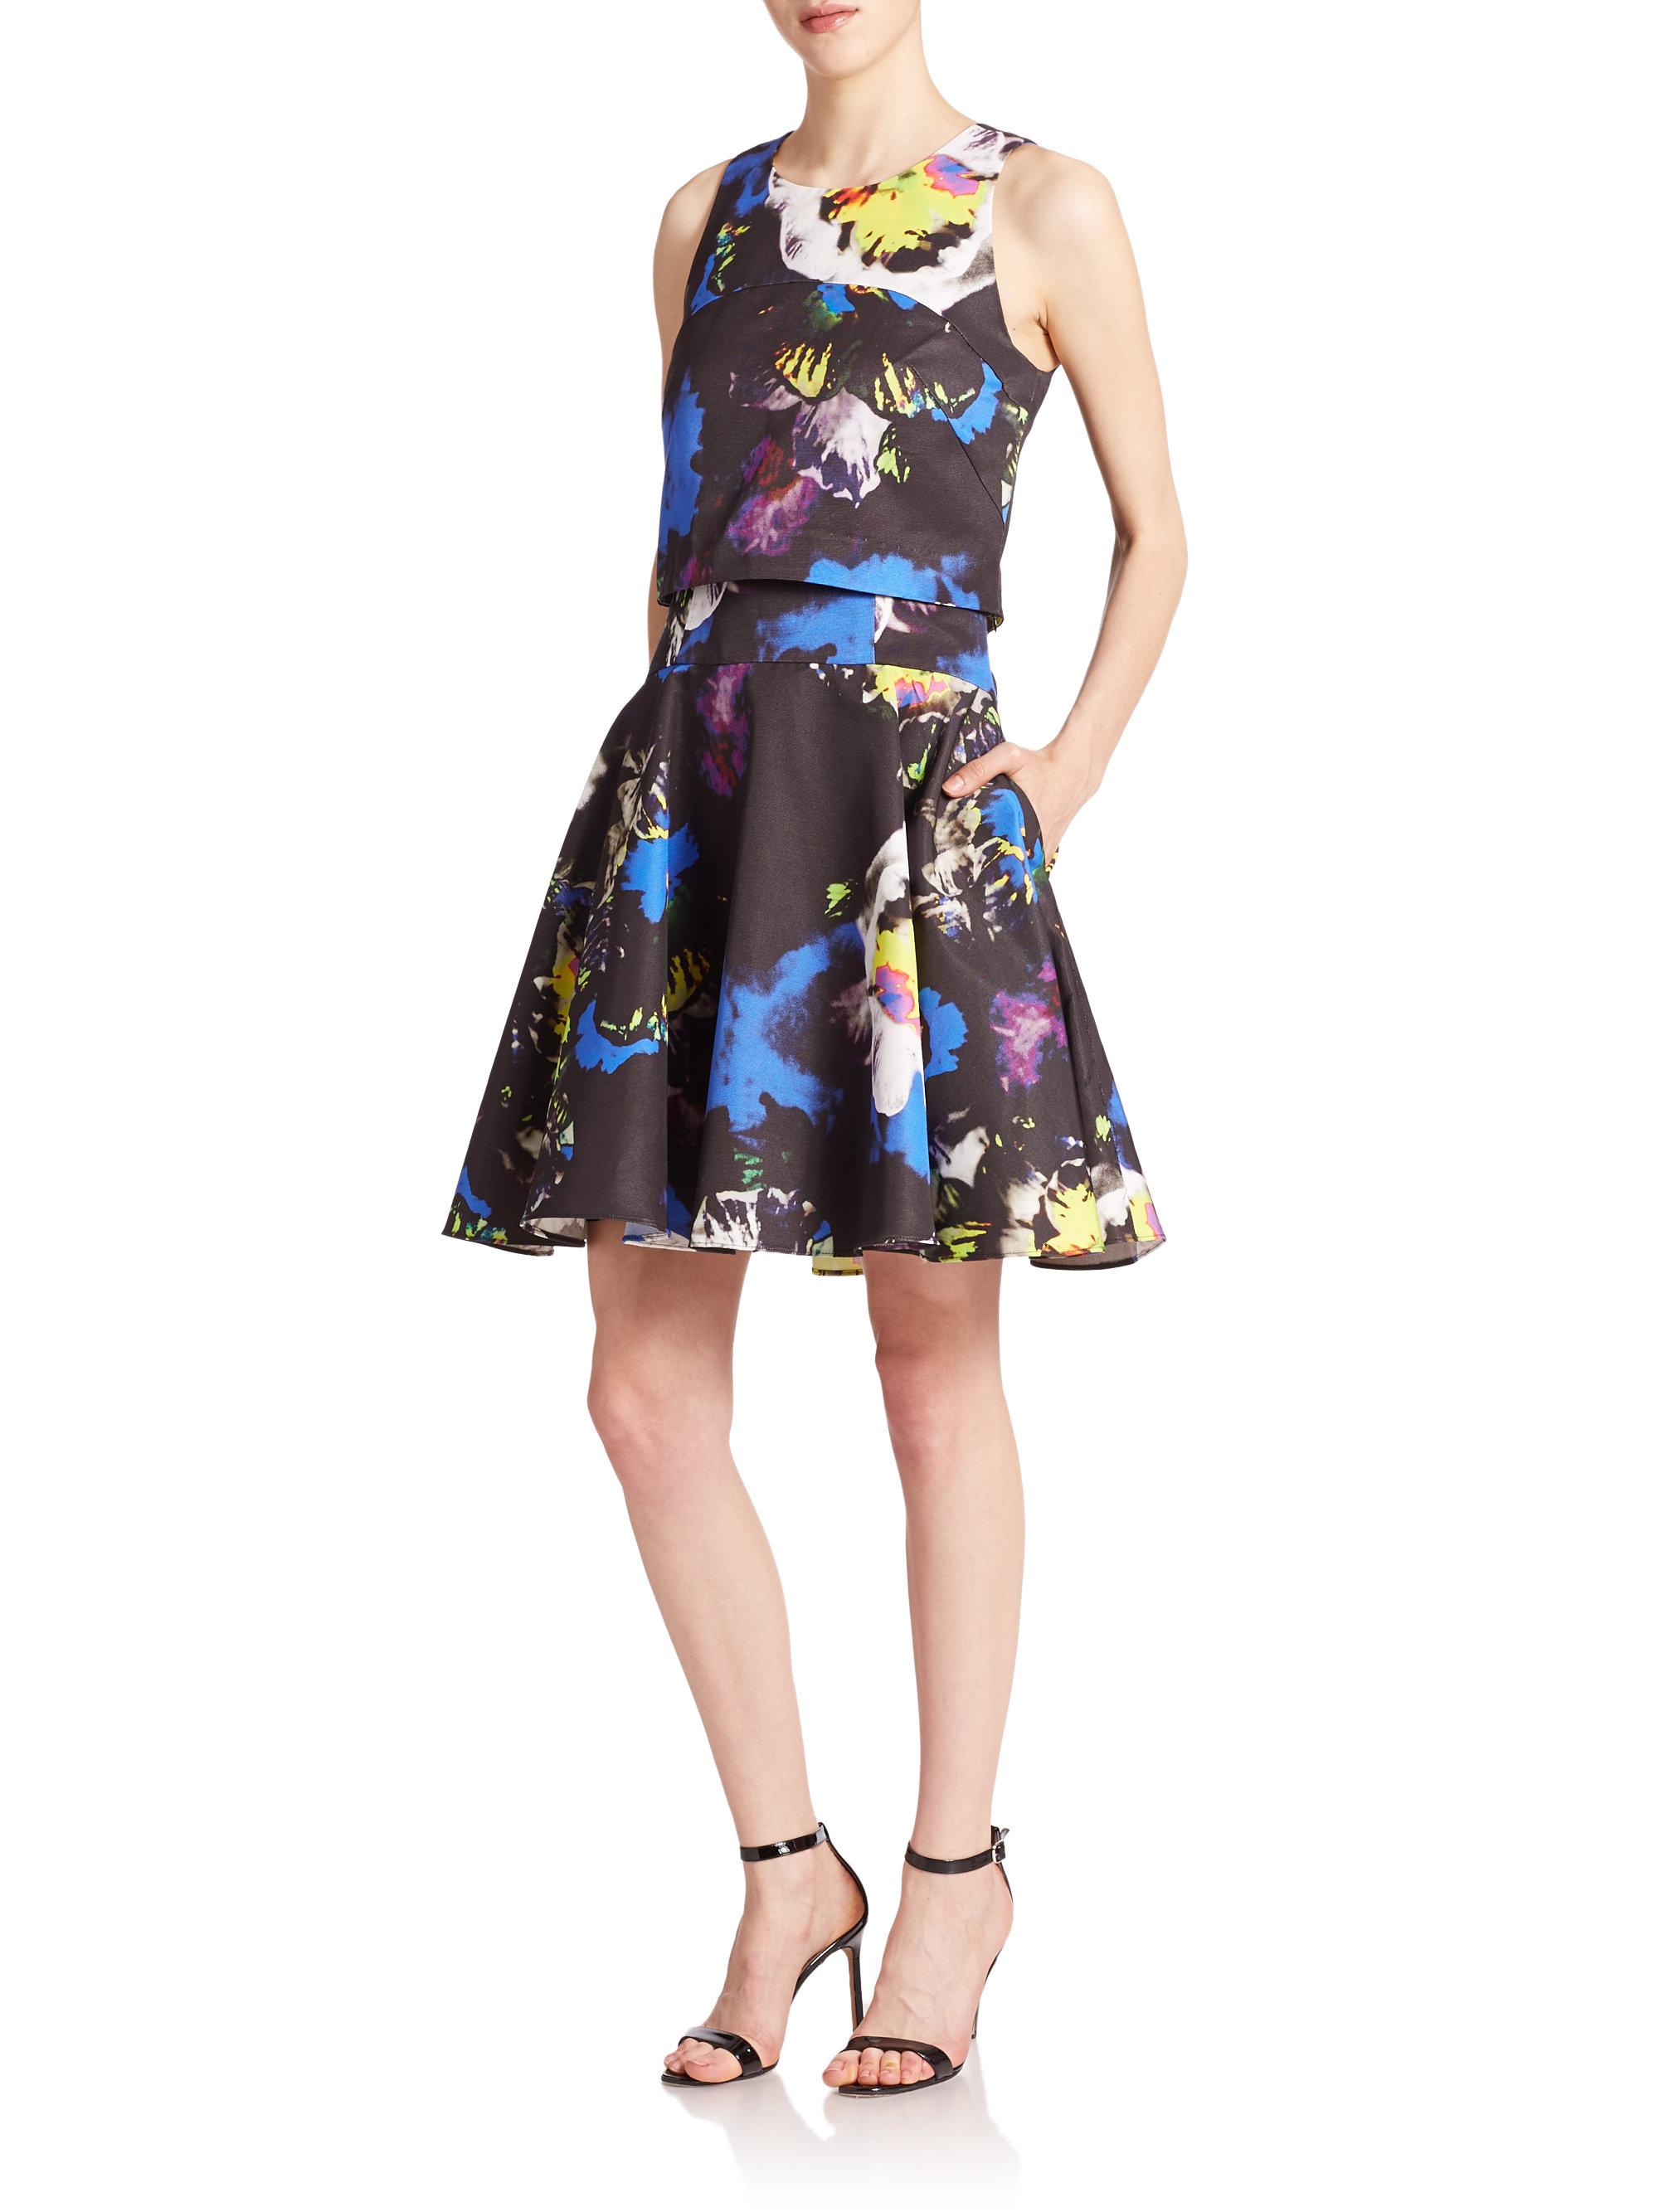 Milly Avery Dress